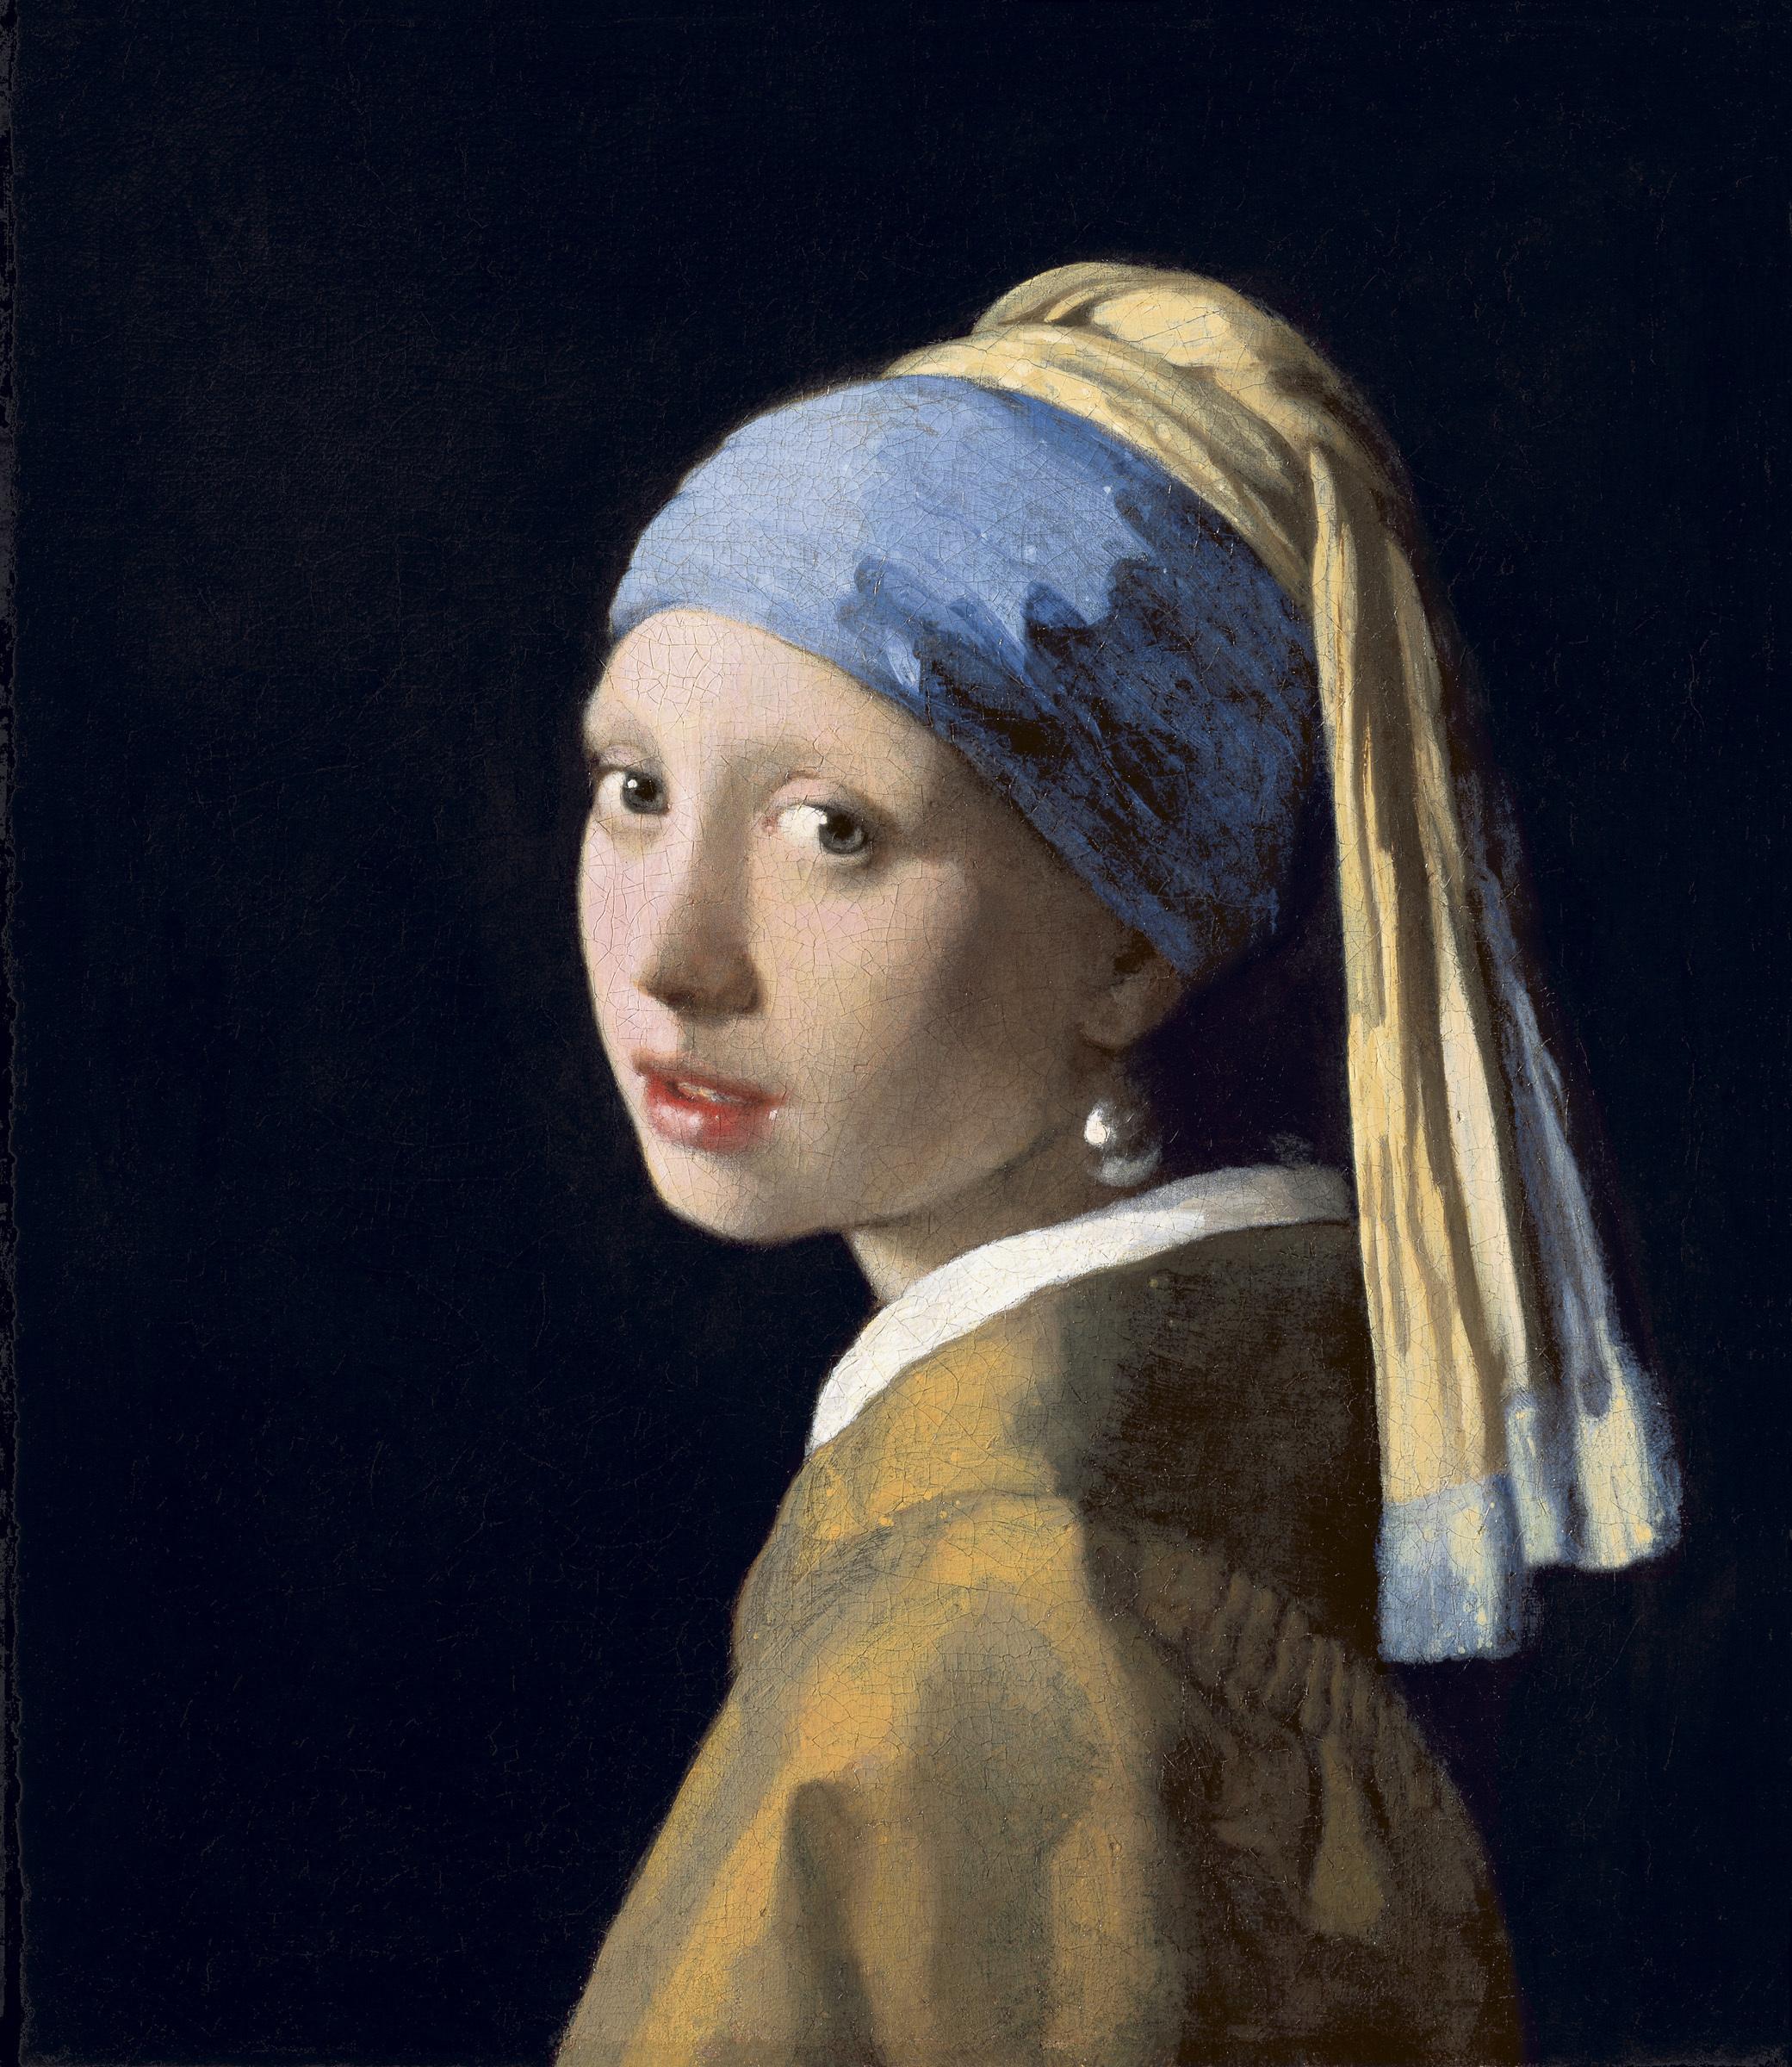 Vermeer's 'Woman In Blue' Brings Her Mystery, Allure To L